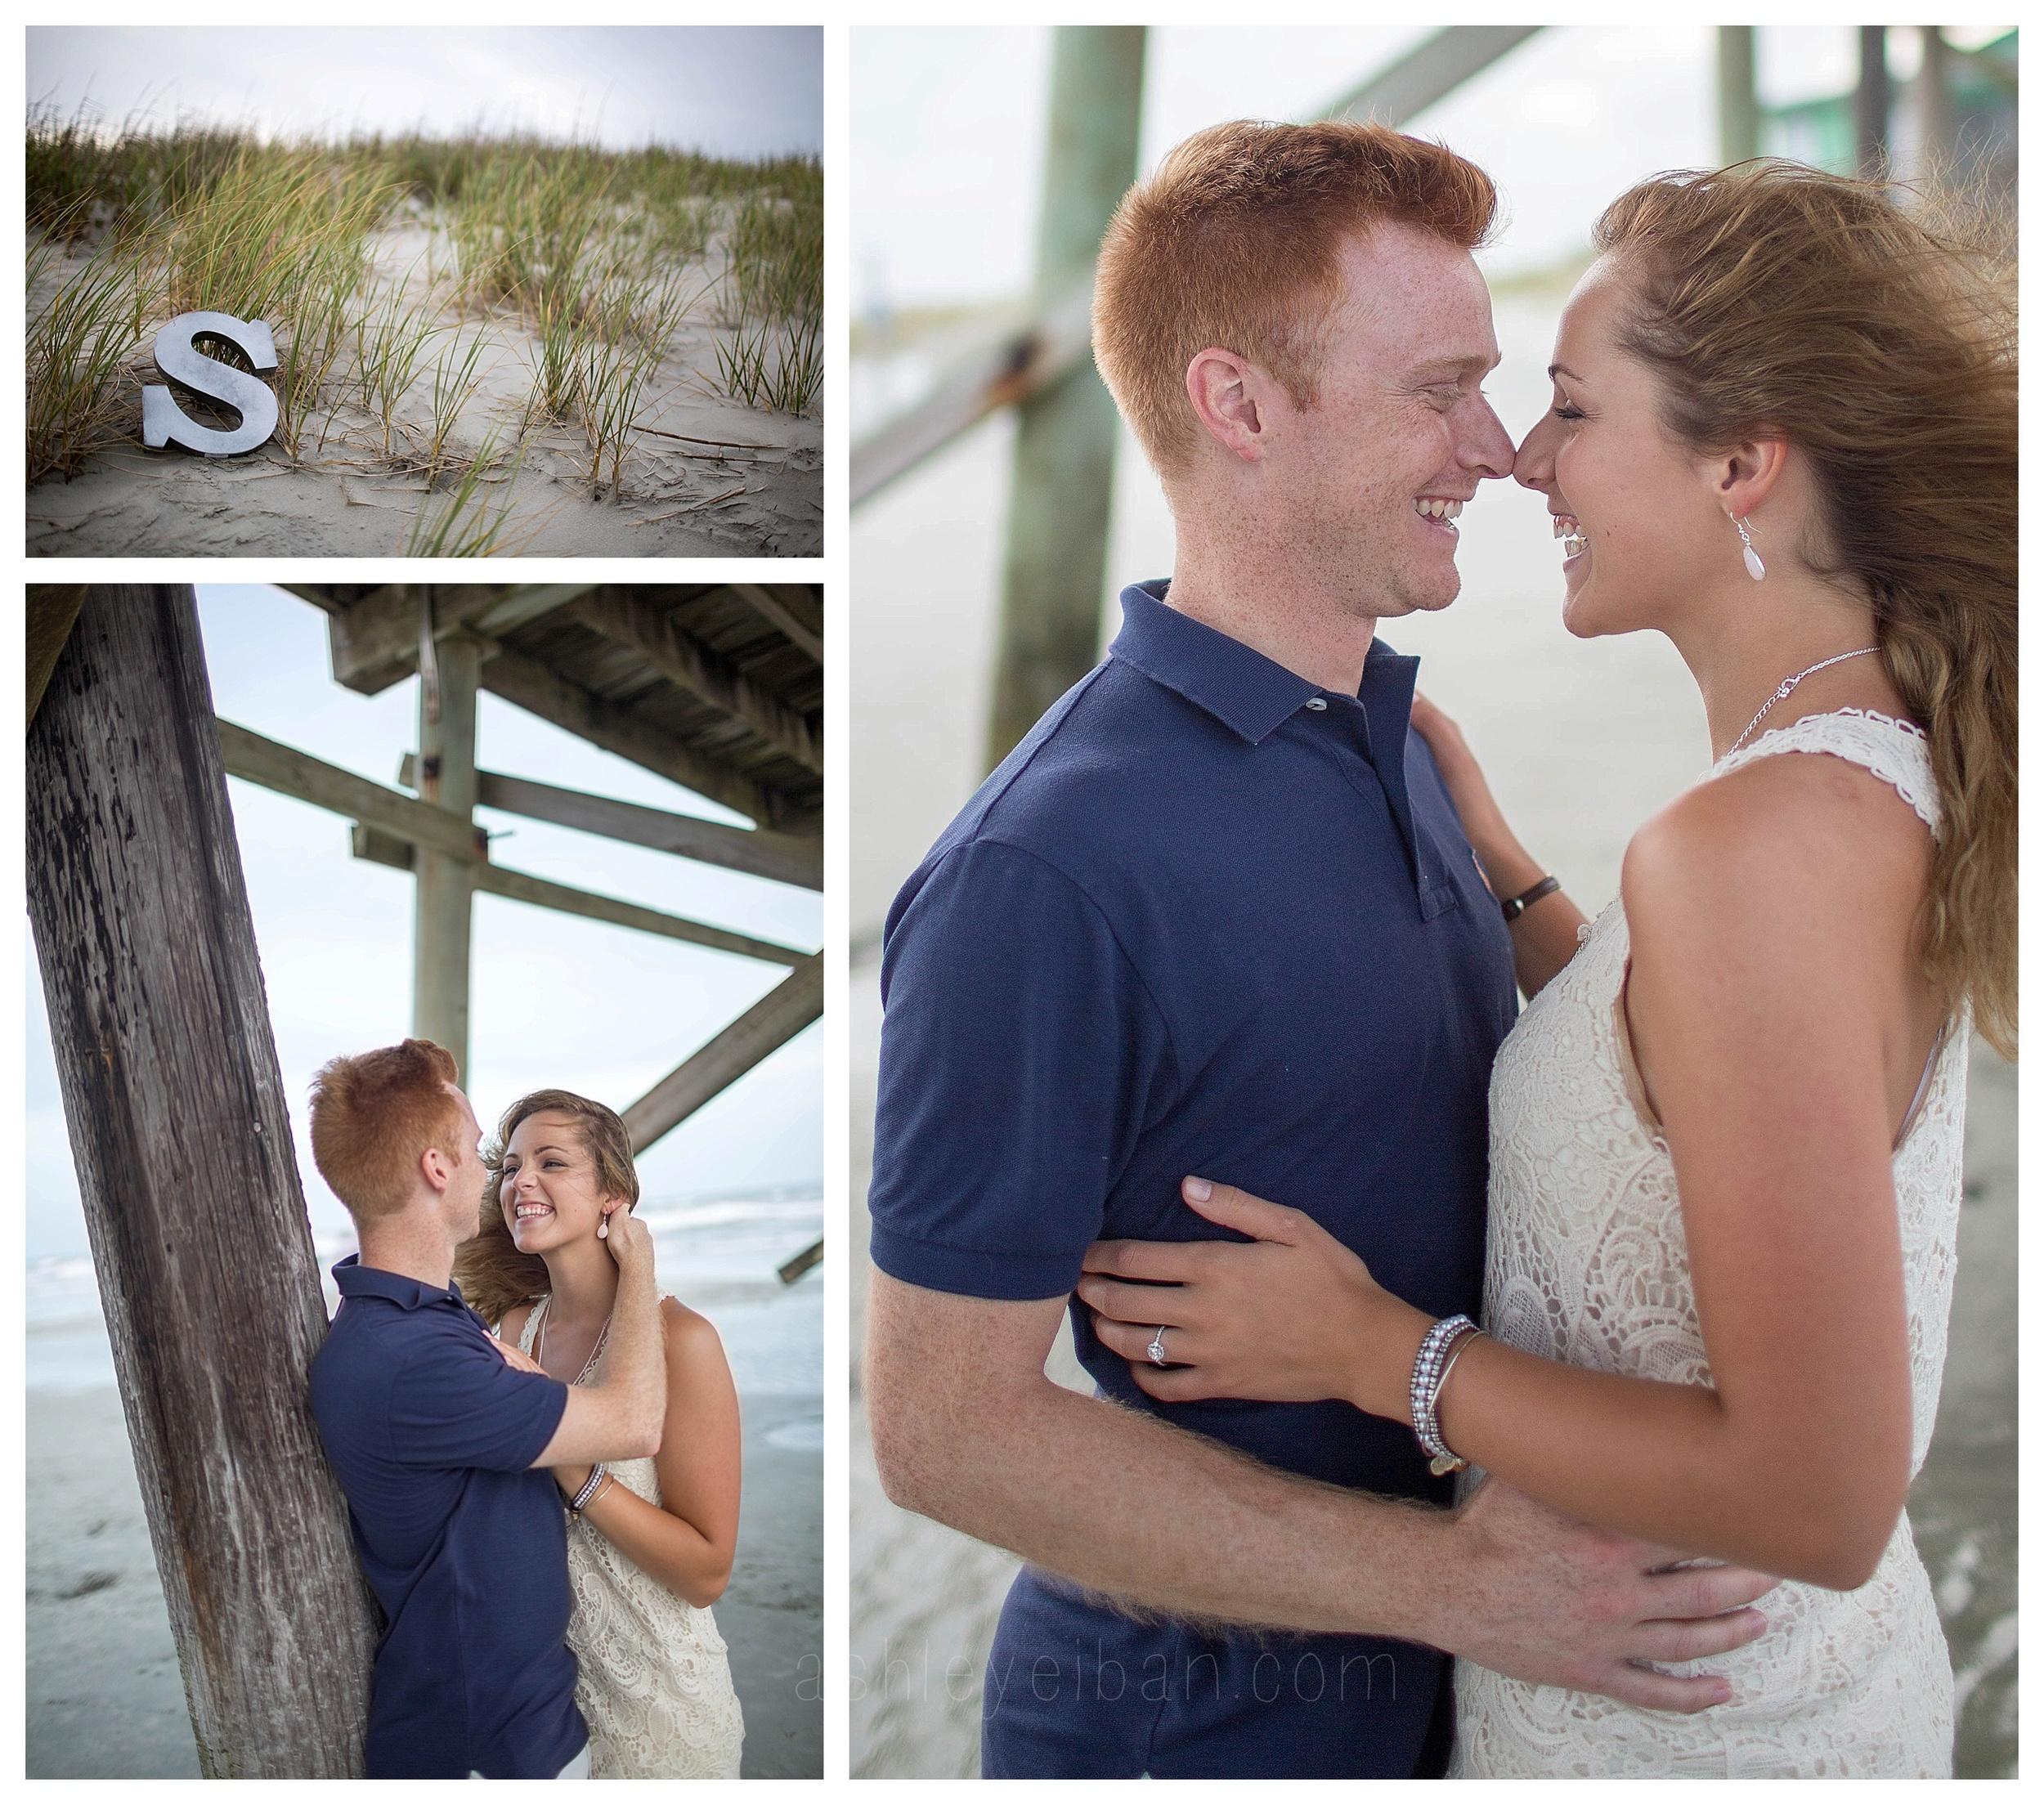 Sunset Beach Wedding and Portrait Photographer || Sunset Beach North Carolina || Beach Engagement Session || www.ashleyeiban.com